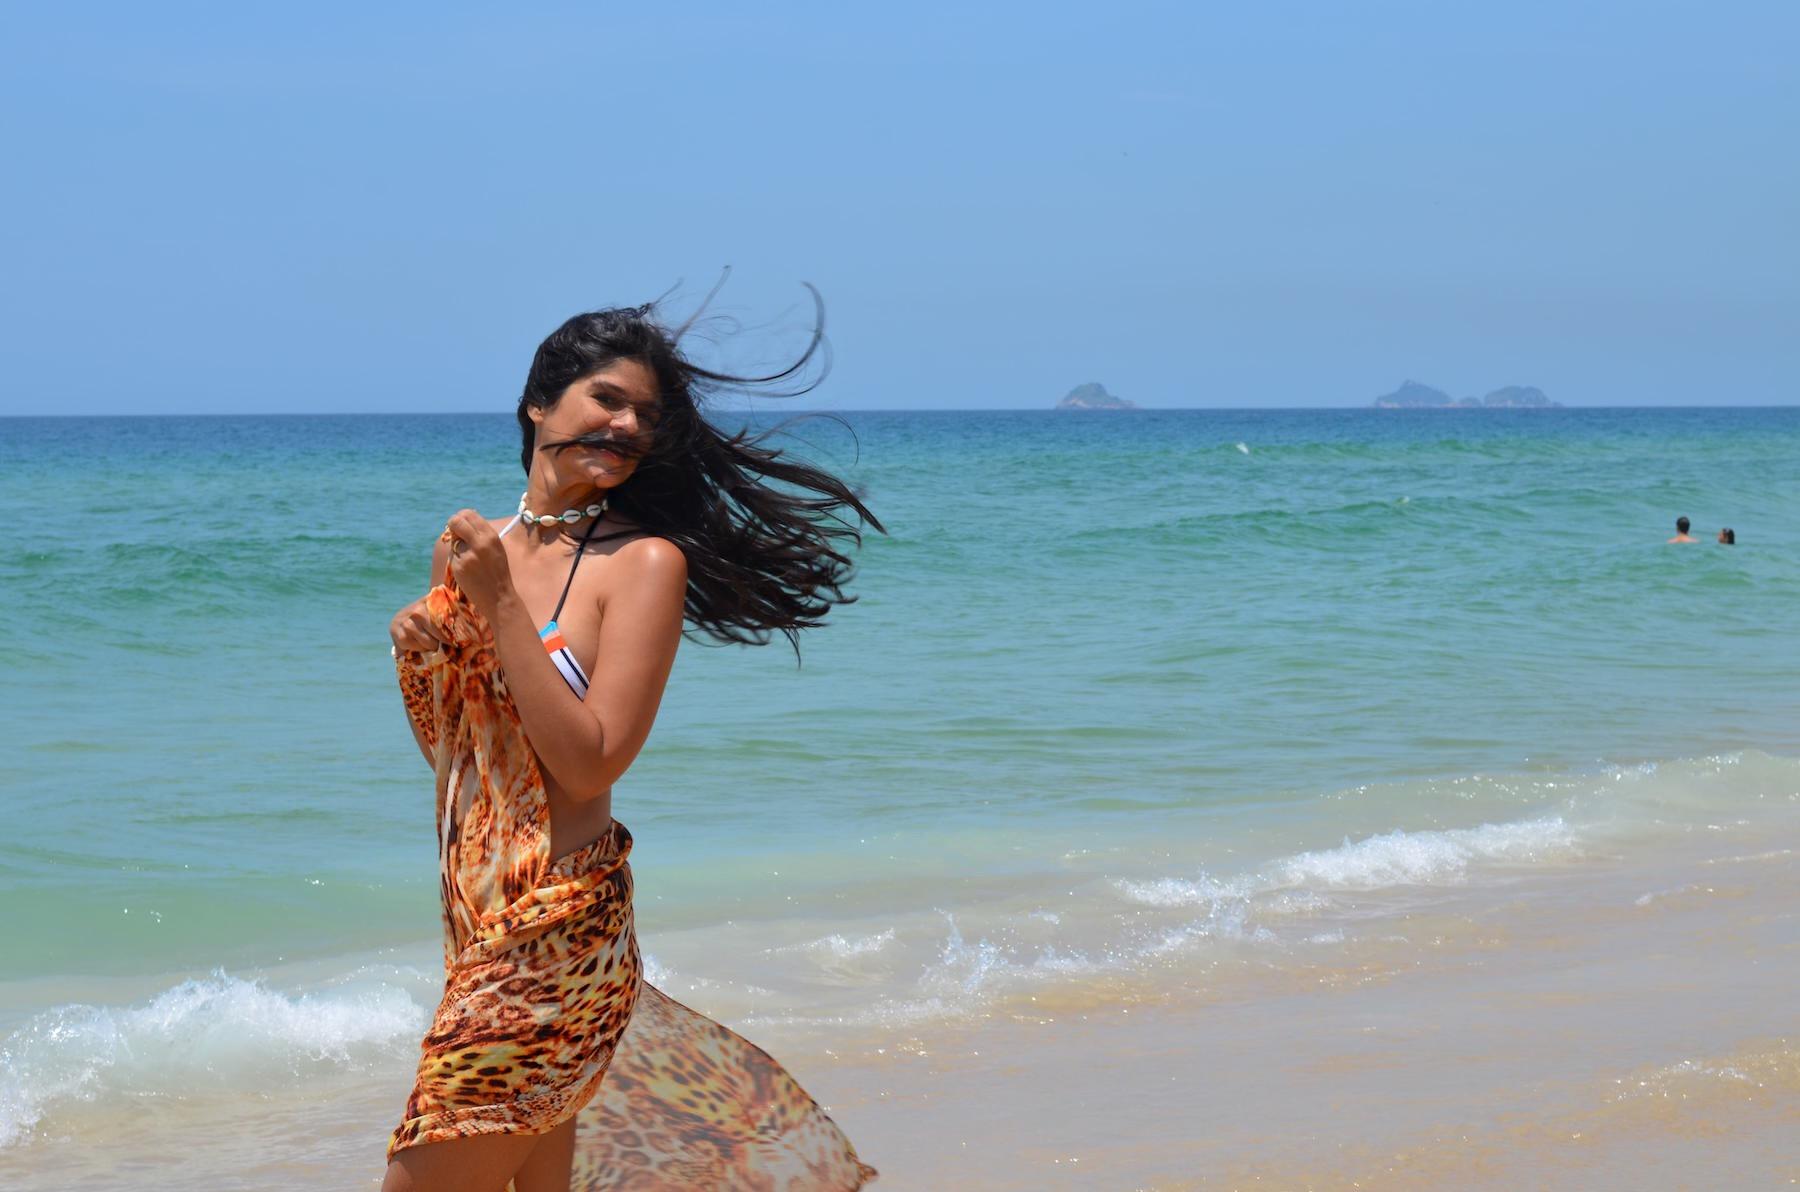 praia-de-ipanema-beta-pinheiro-2